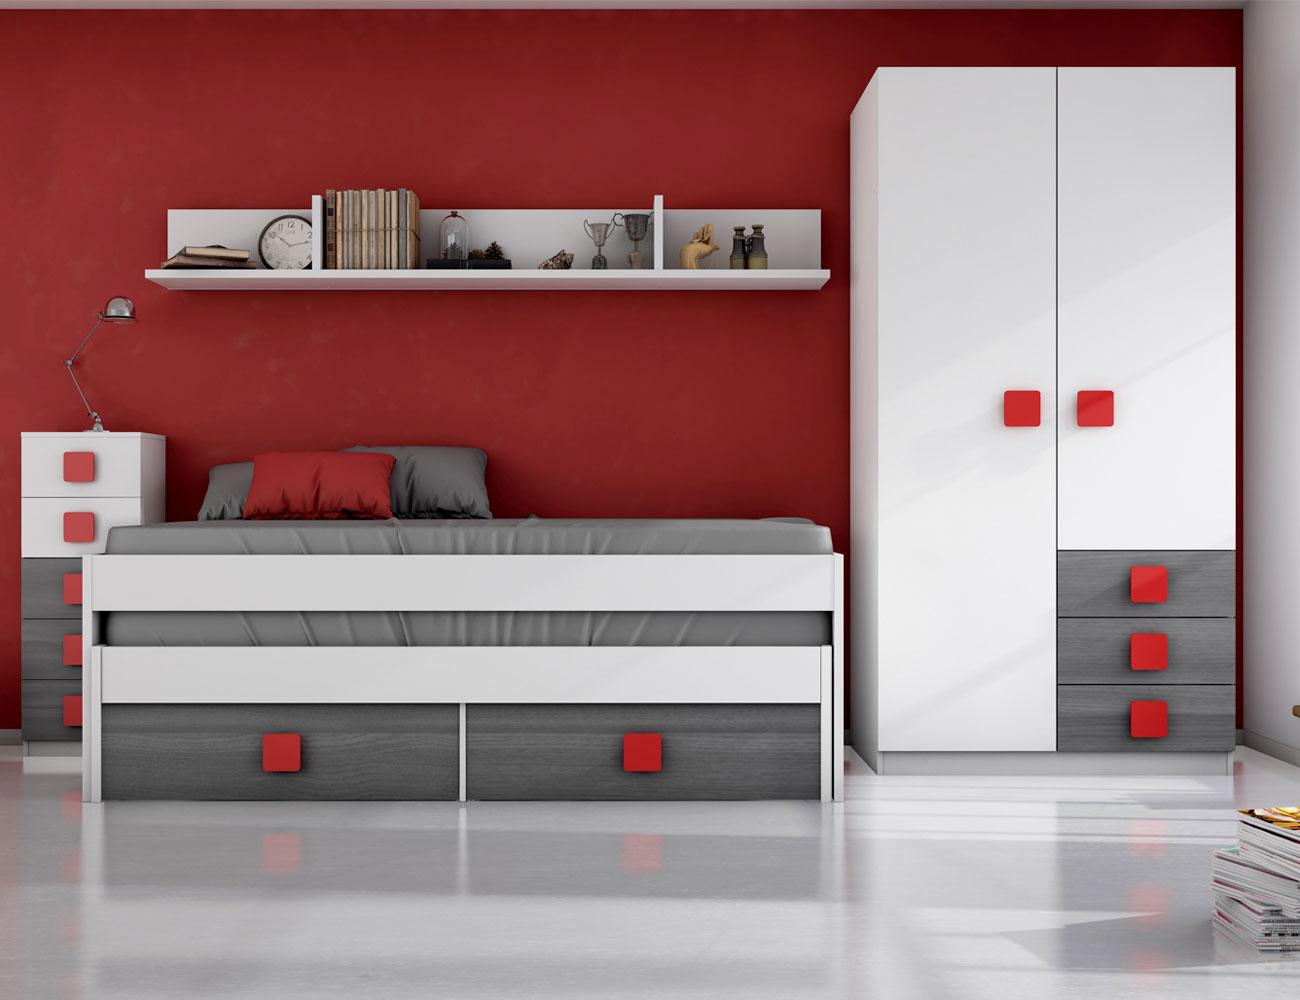 Dormitorio juvenil ceniza rojo5